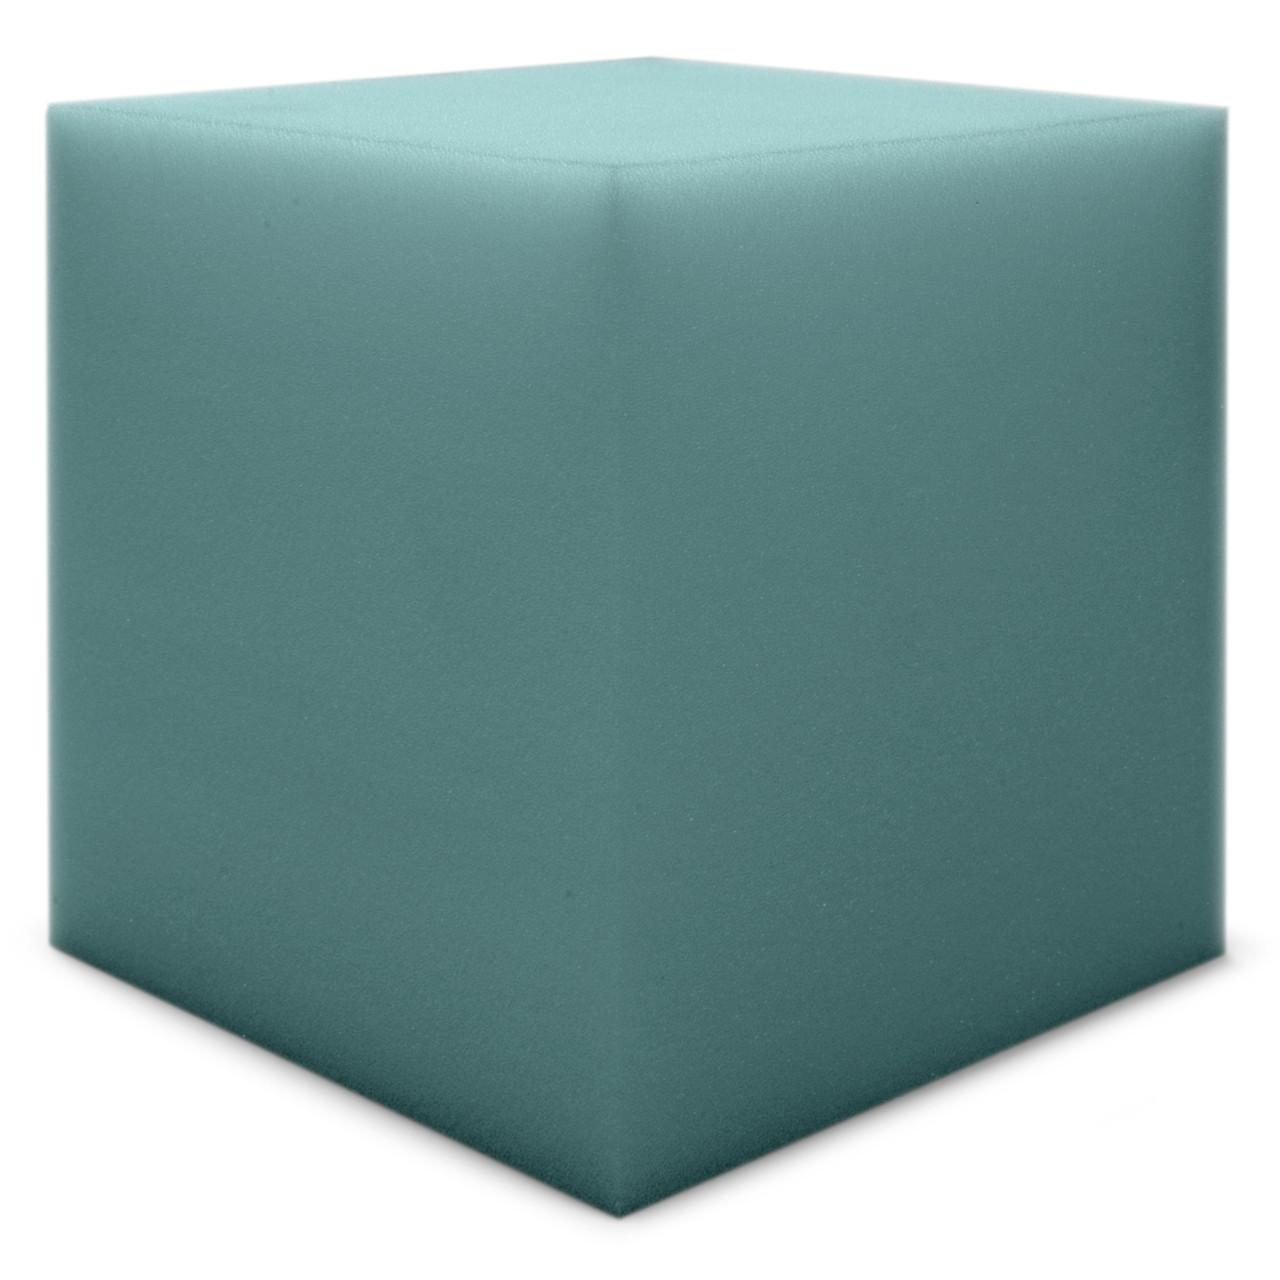 Бас ловушка Ecosound КУБ угловой 15х15х15 см Цвет голубой